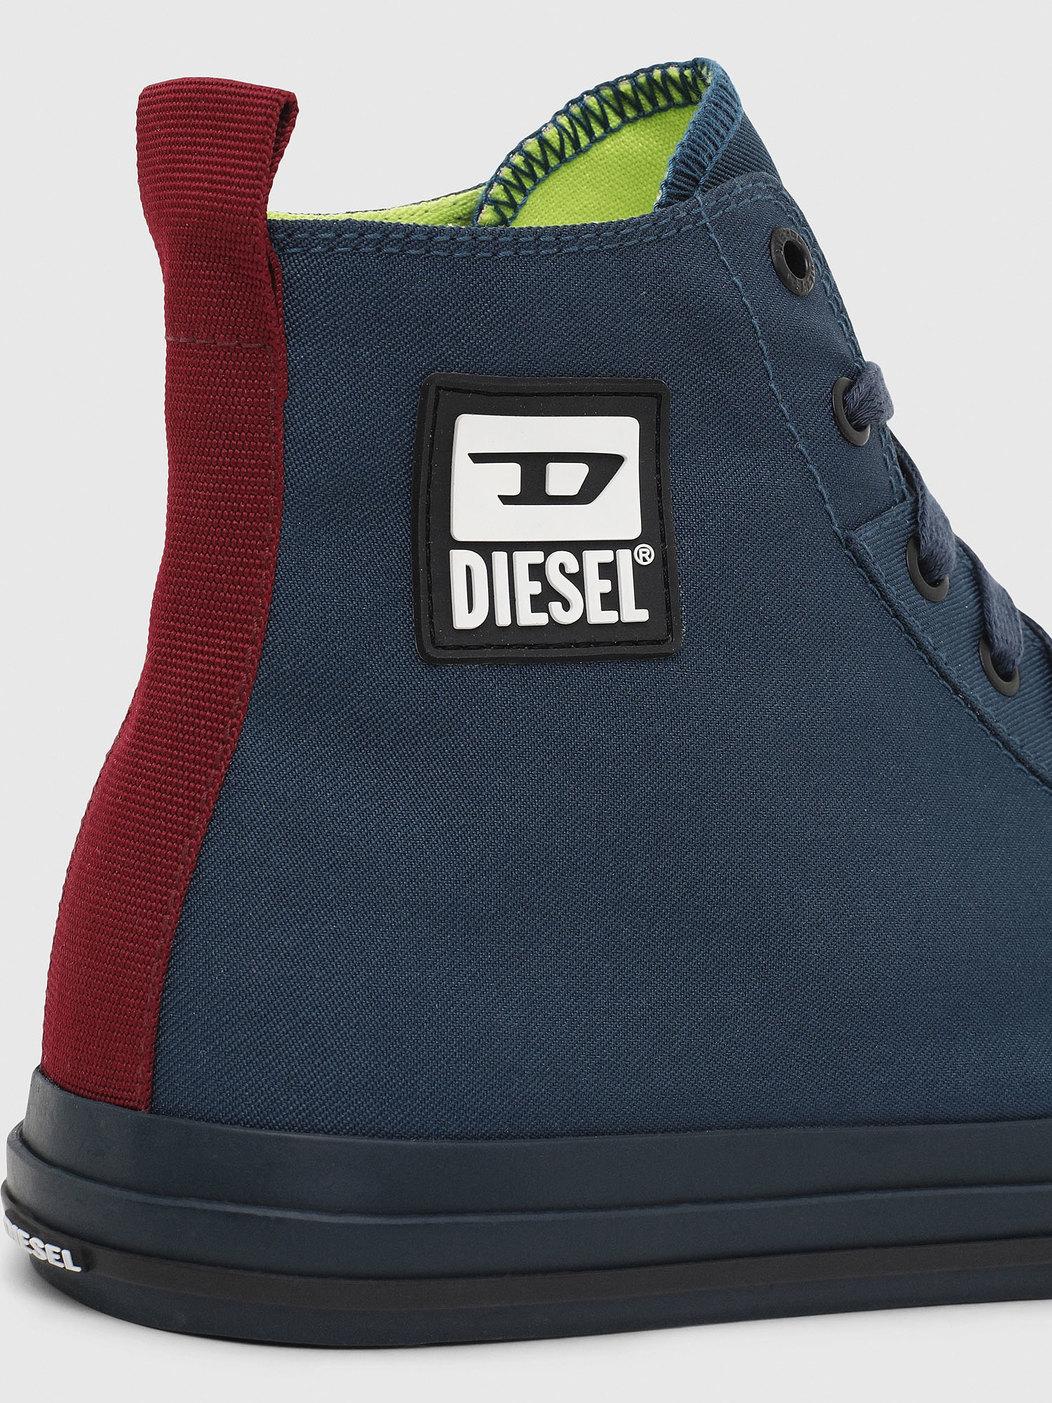 High-Top Sneakers In Nylon